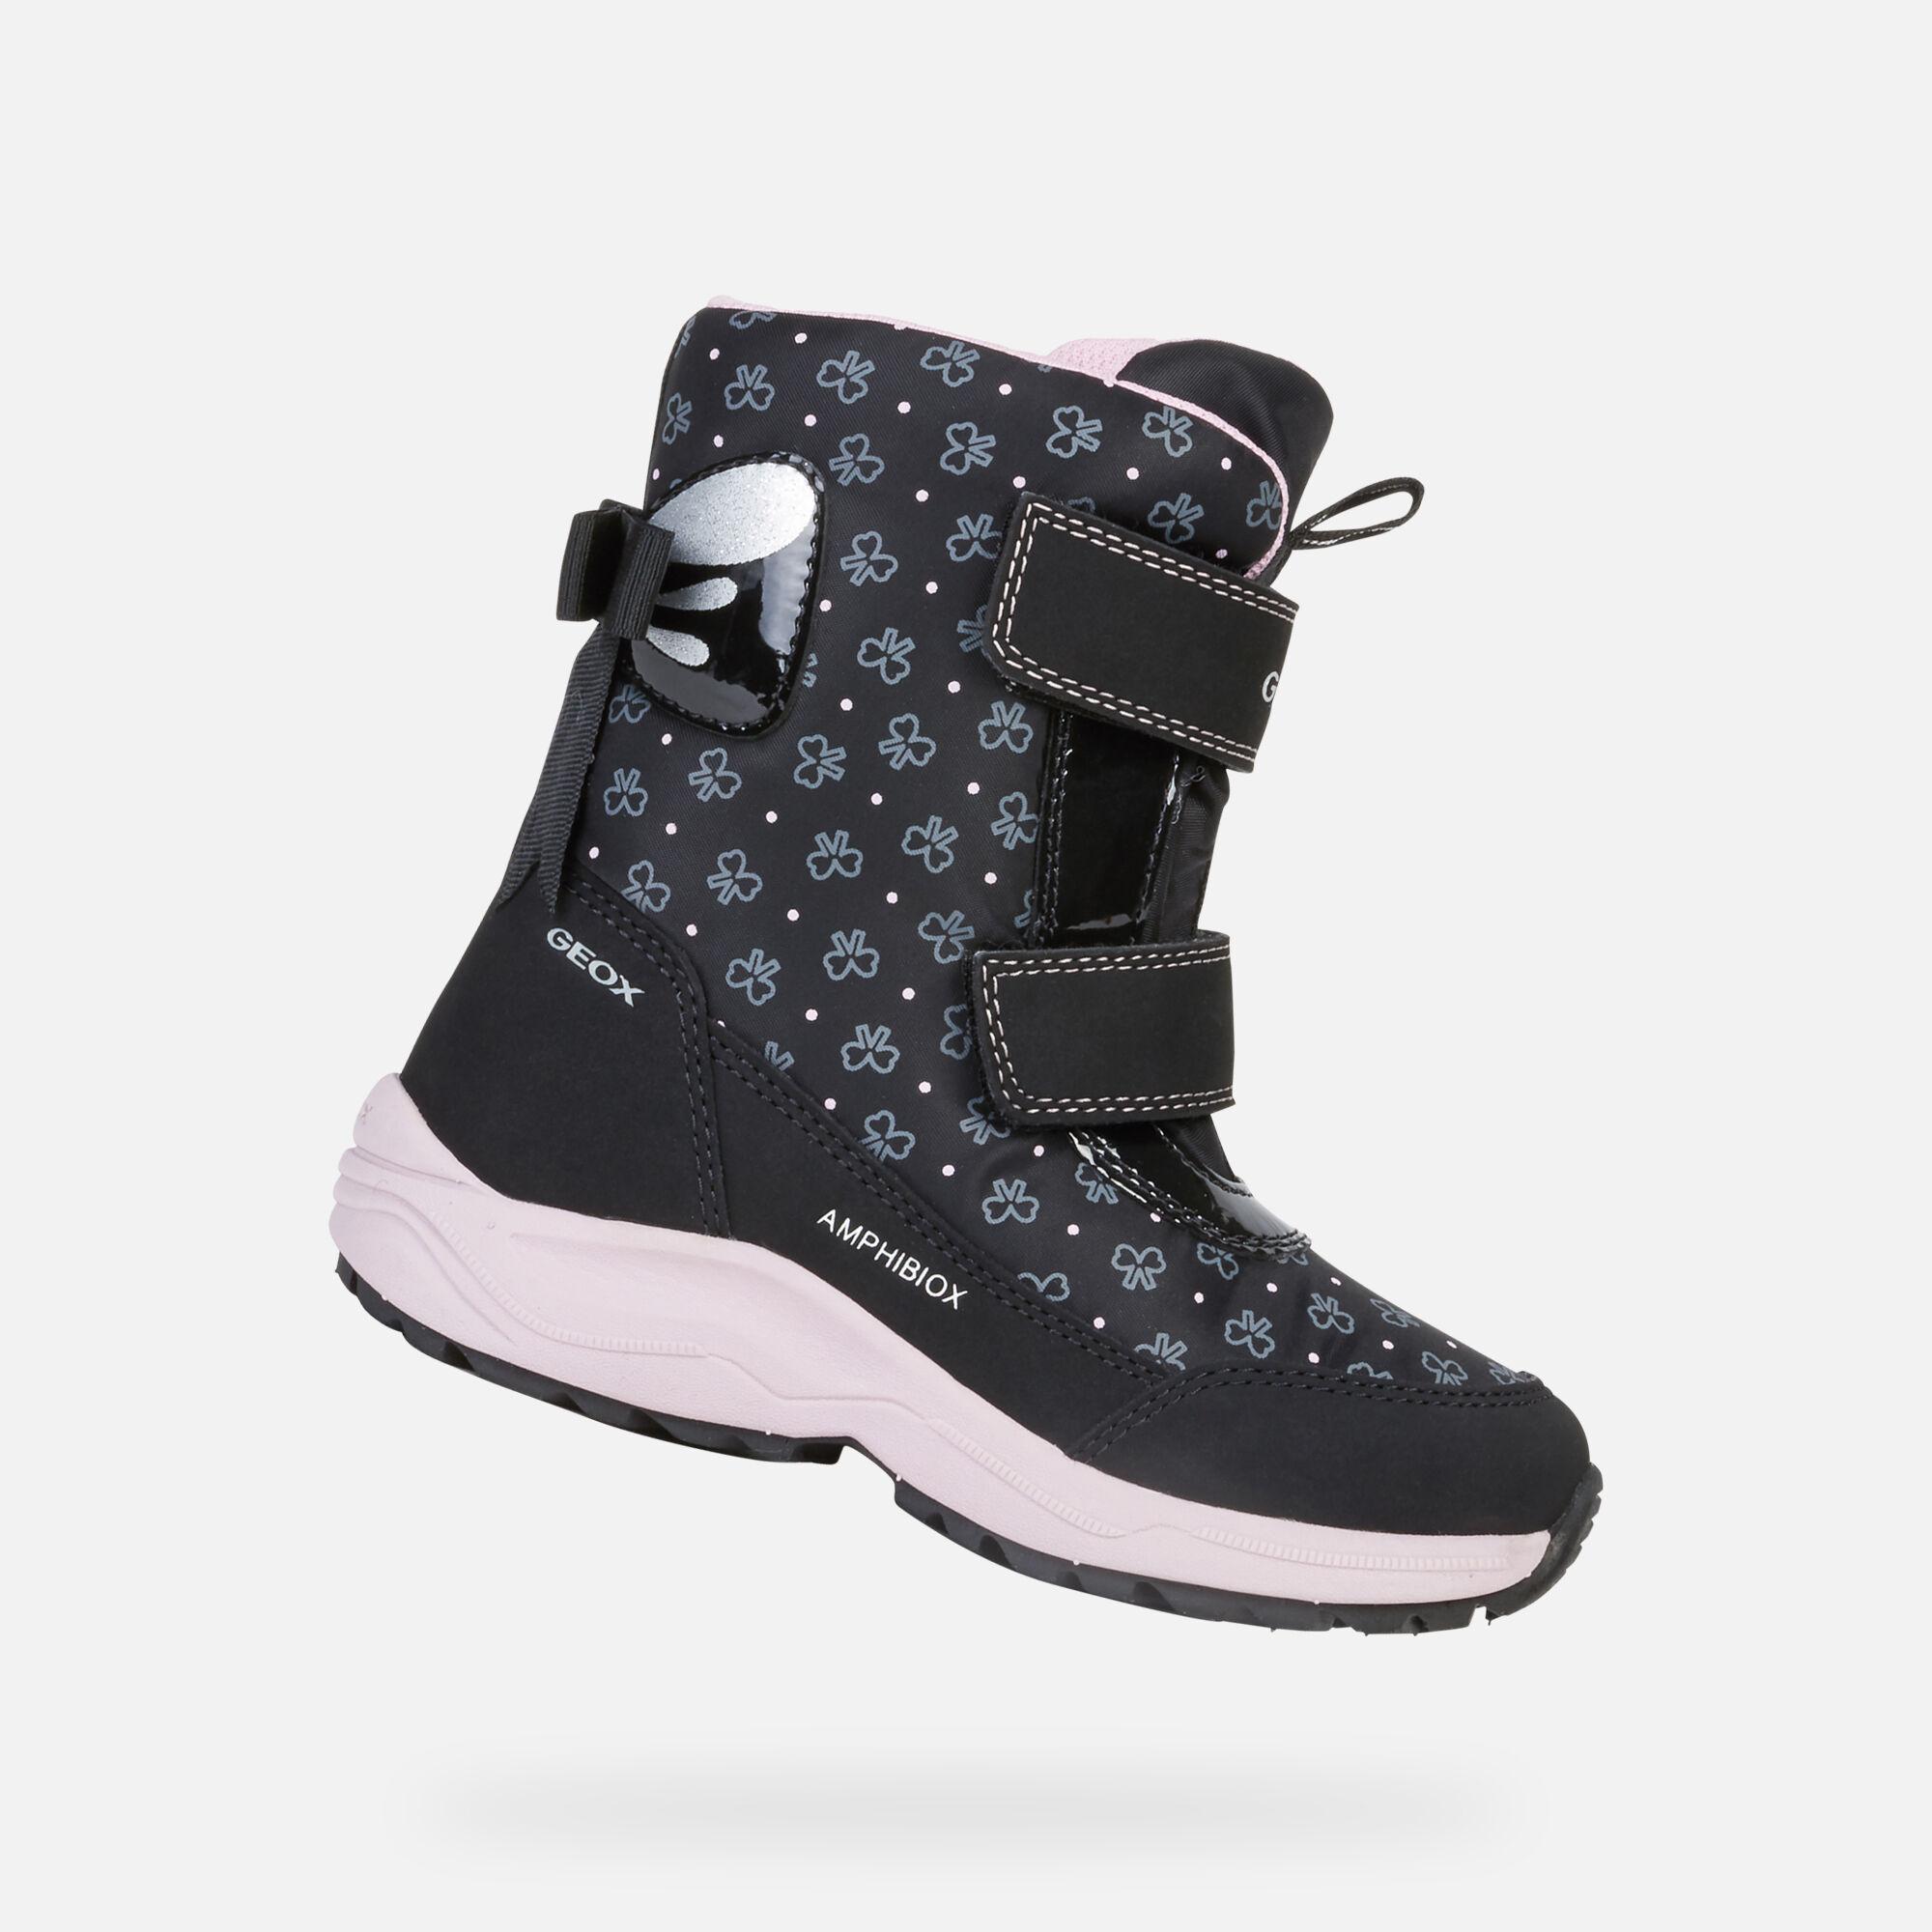 Geox Kuray 2 Waterproof Sneaker (Toddler, Little Kid & Big